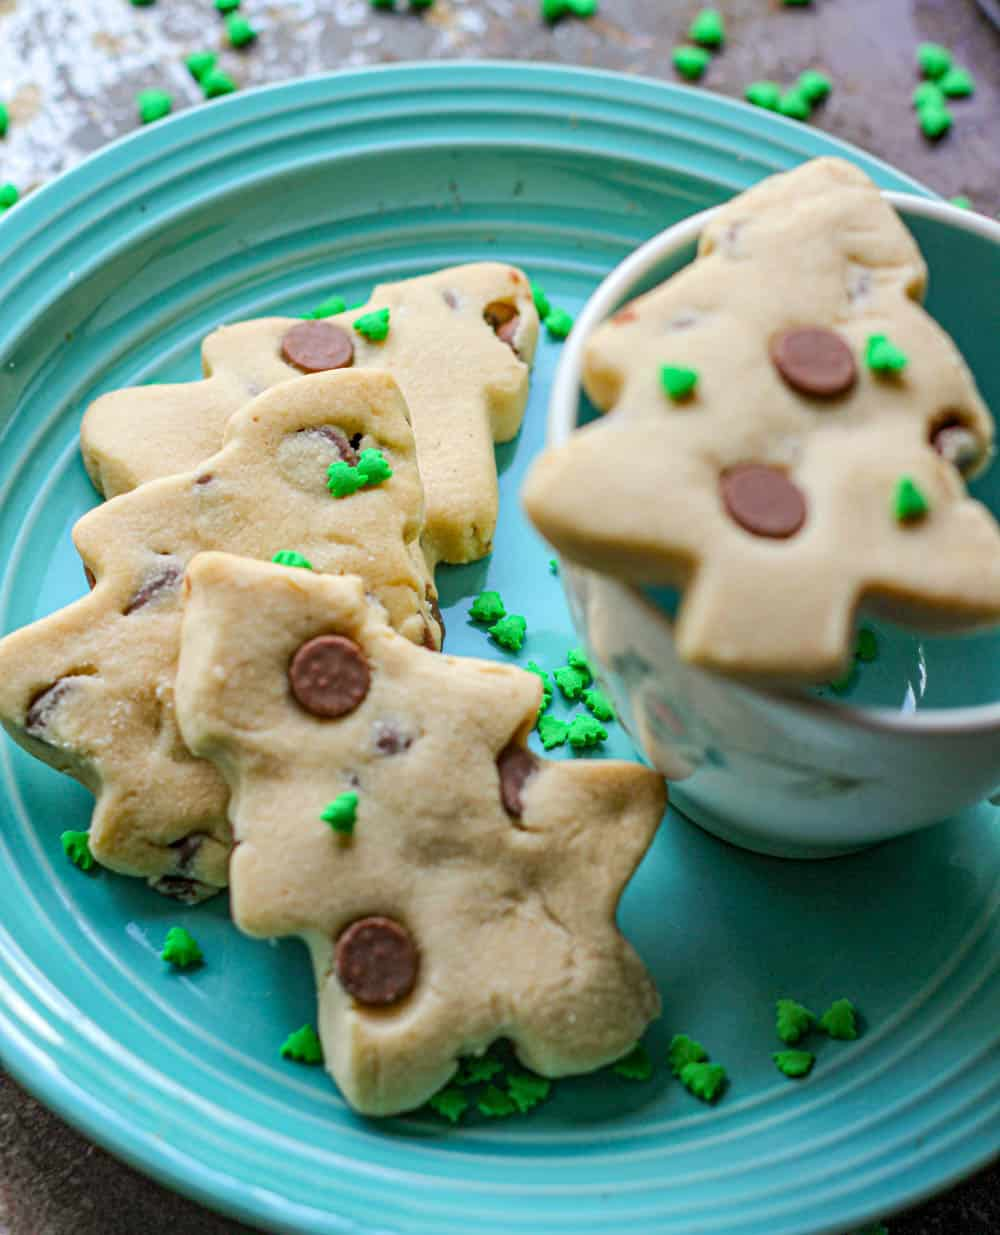 Peanut Butter Milk Chocolate Chip Shortbread Cookies